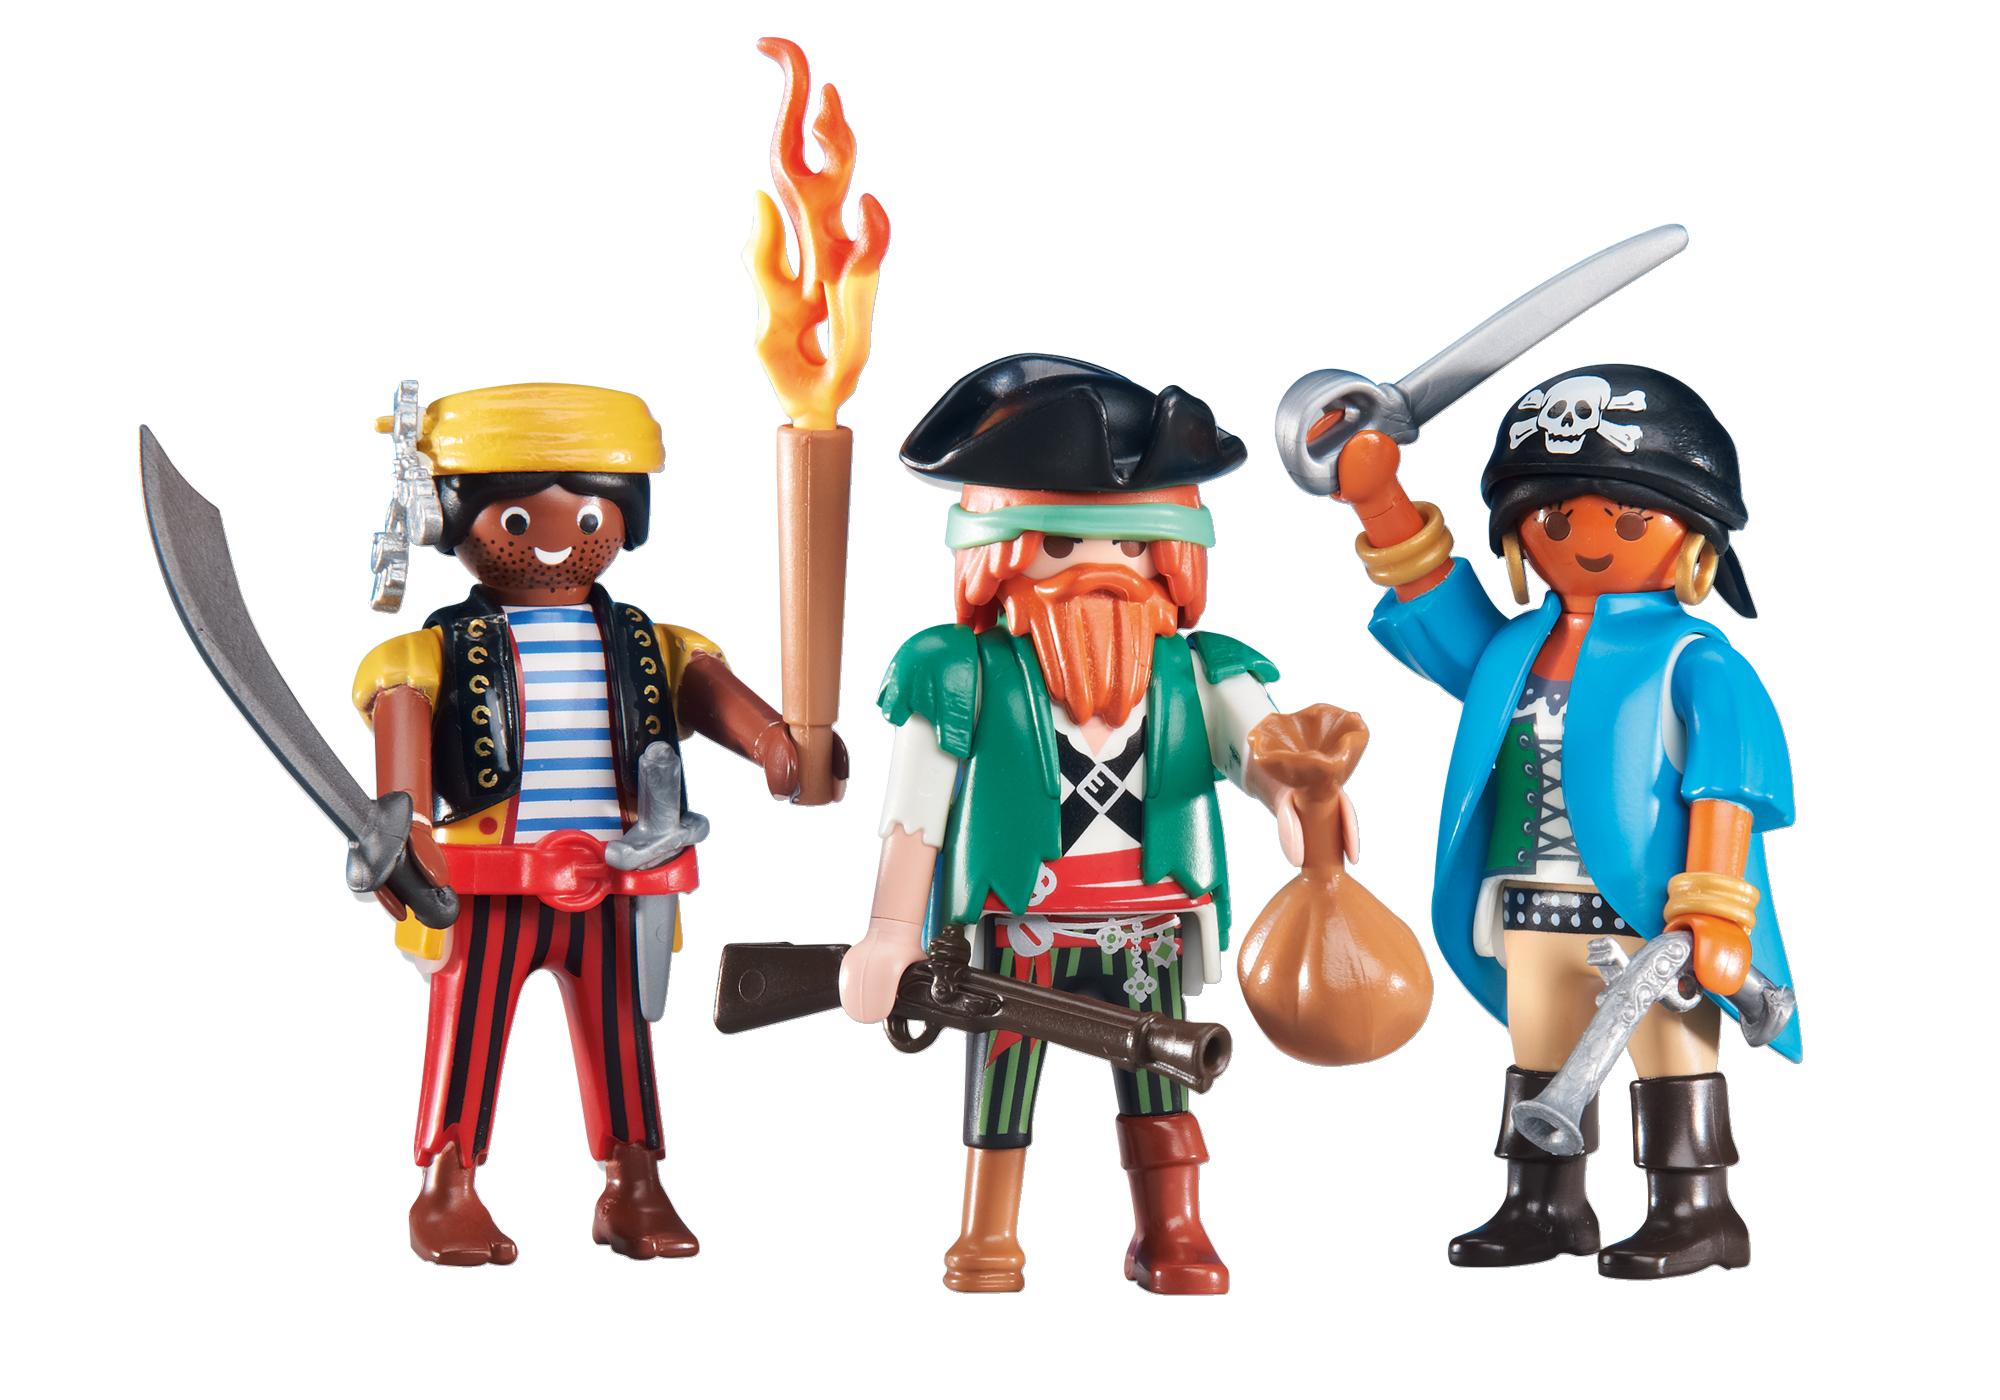 http://media.playmobil.com/i/playmobil/6434_product_detail/3 Piraten